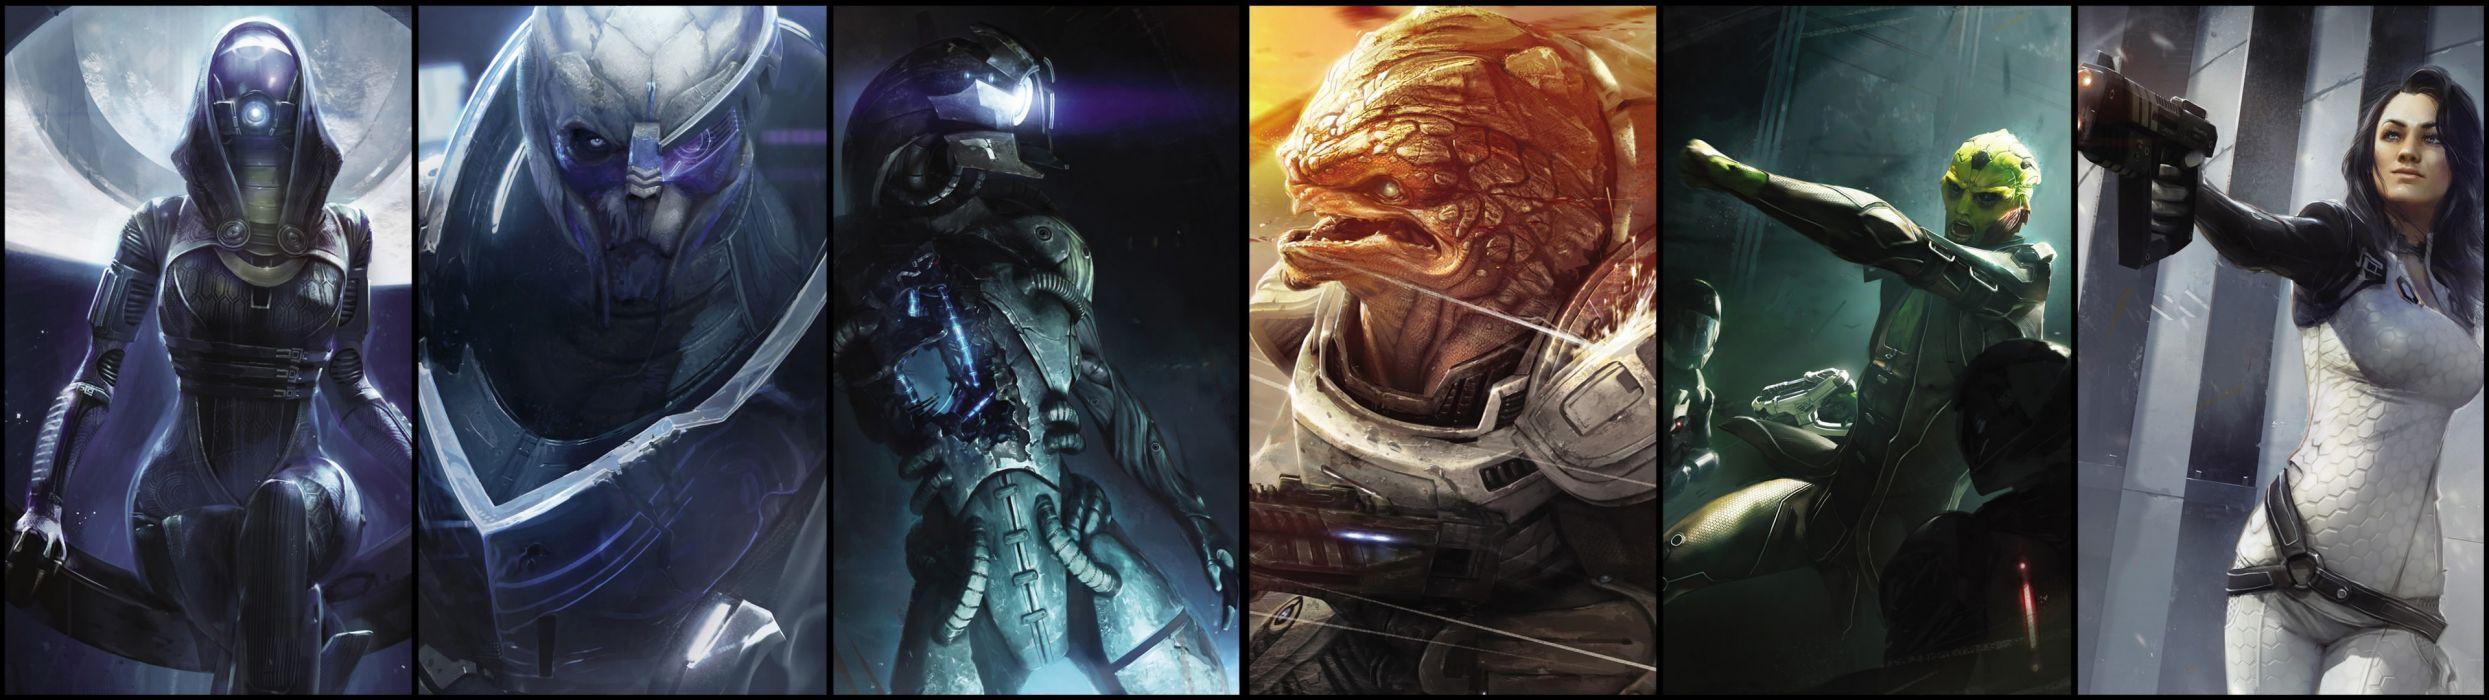 Mass Effect sci-fi multi dual wallpaper